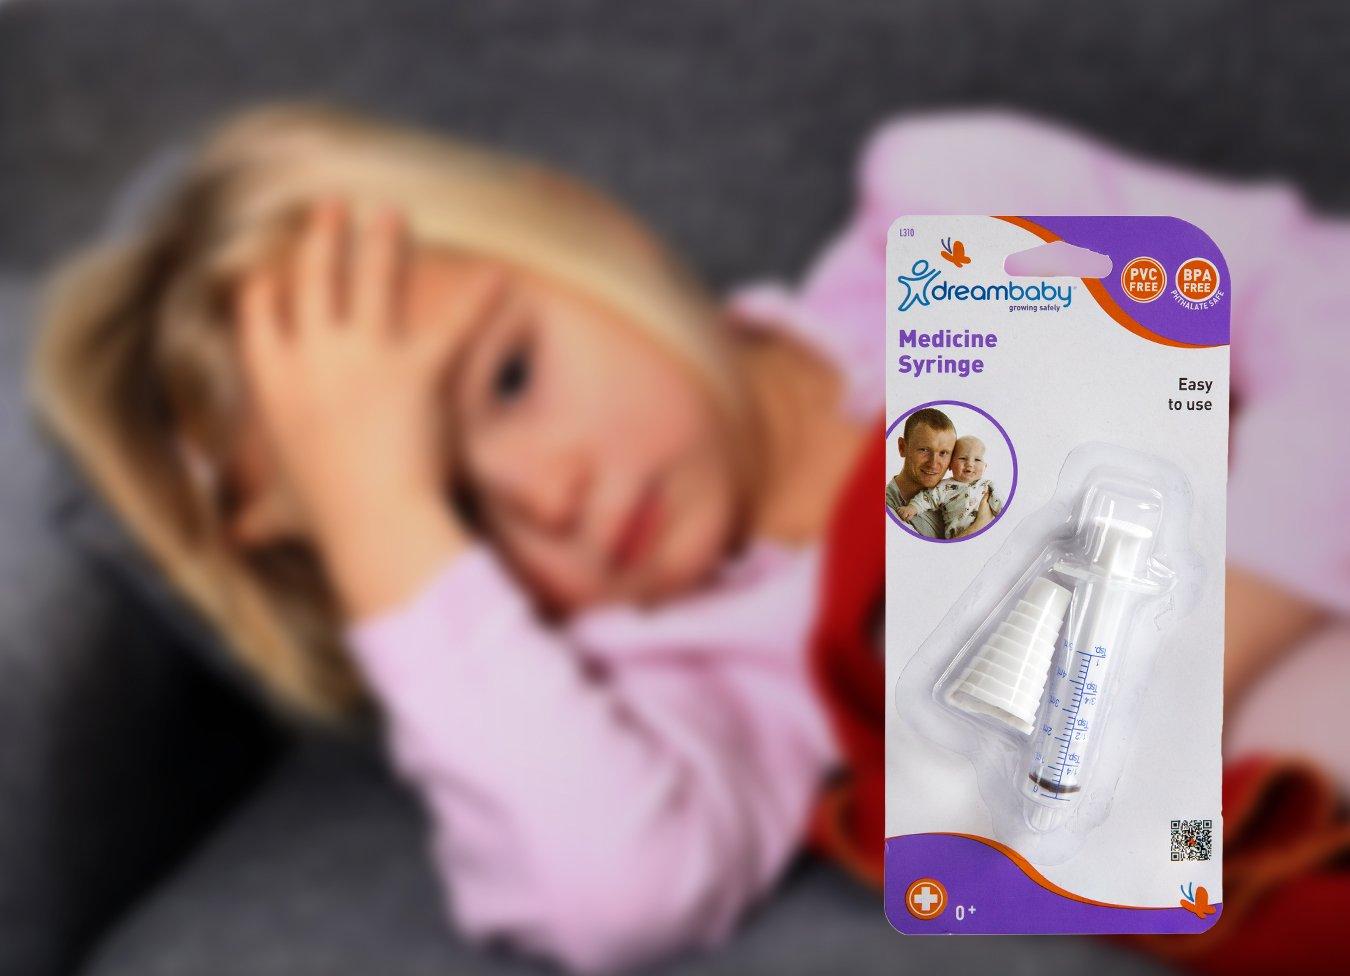 Dreambaby Medicine Syringe by Dreambaby